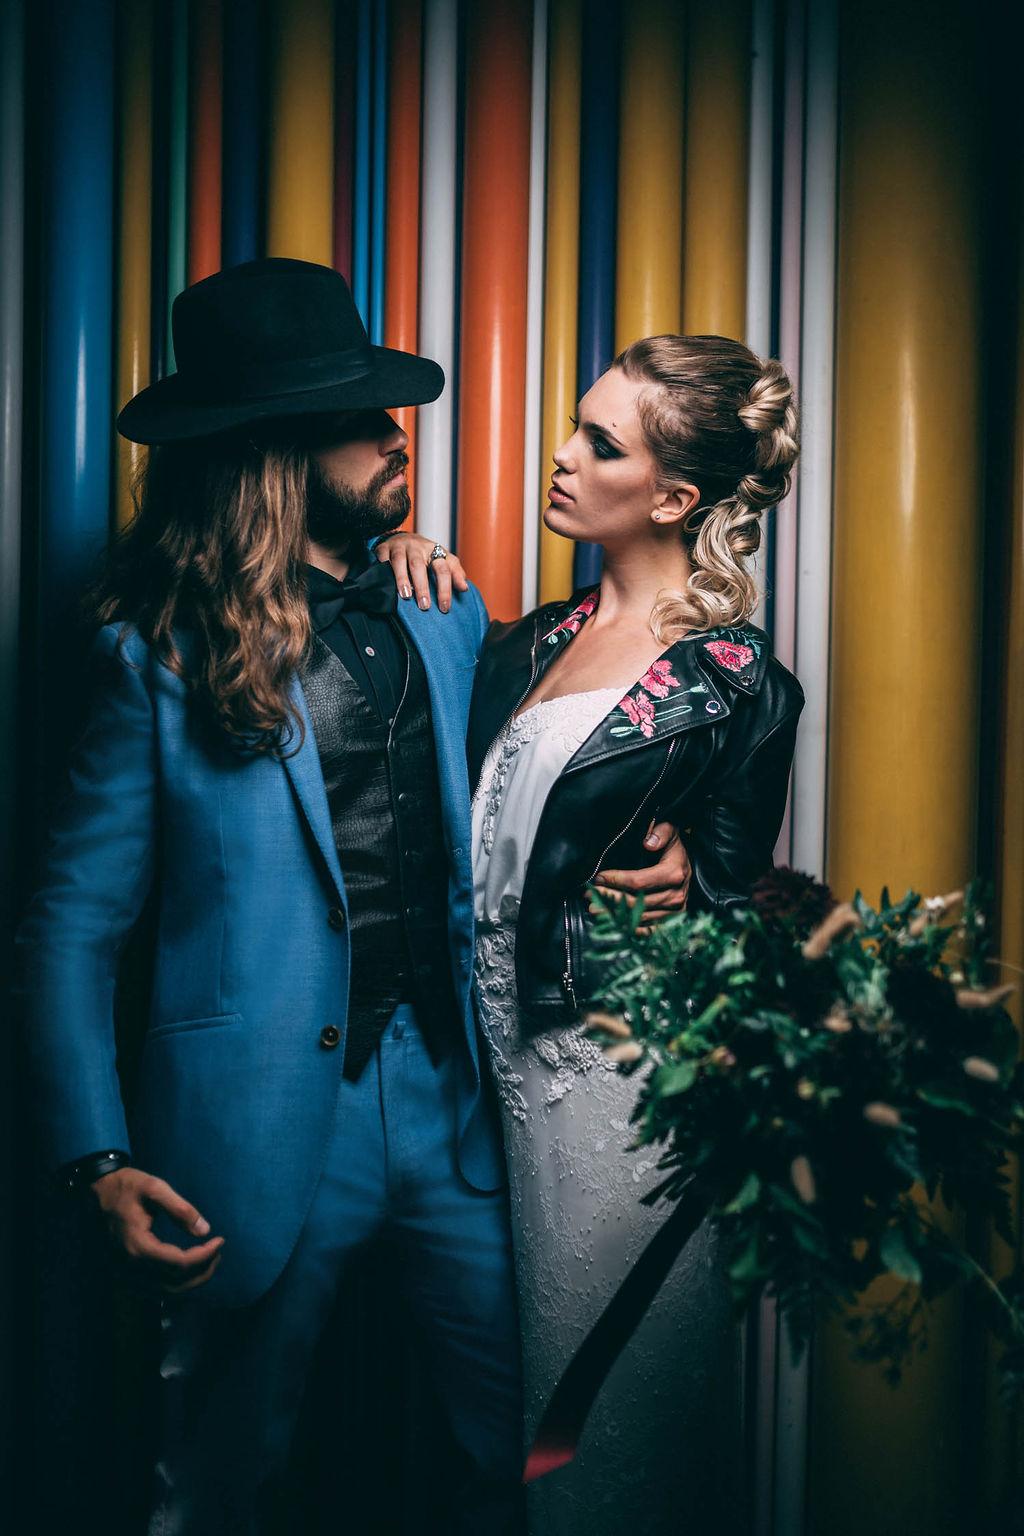 4_4_rock_couple_4_looks_sidneyonthemoon_photographe_chrisvonmartial_robe_mariee_costume_paris_wedding_web.jpg